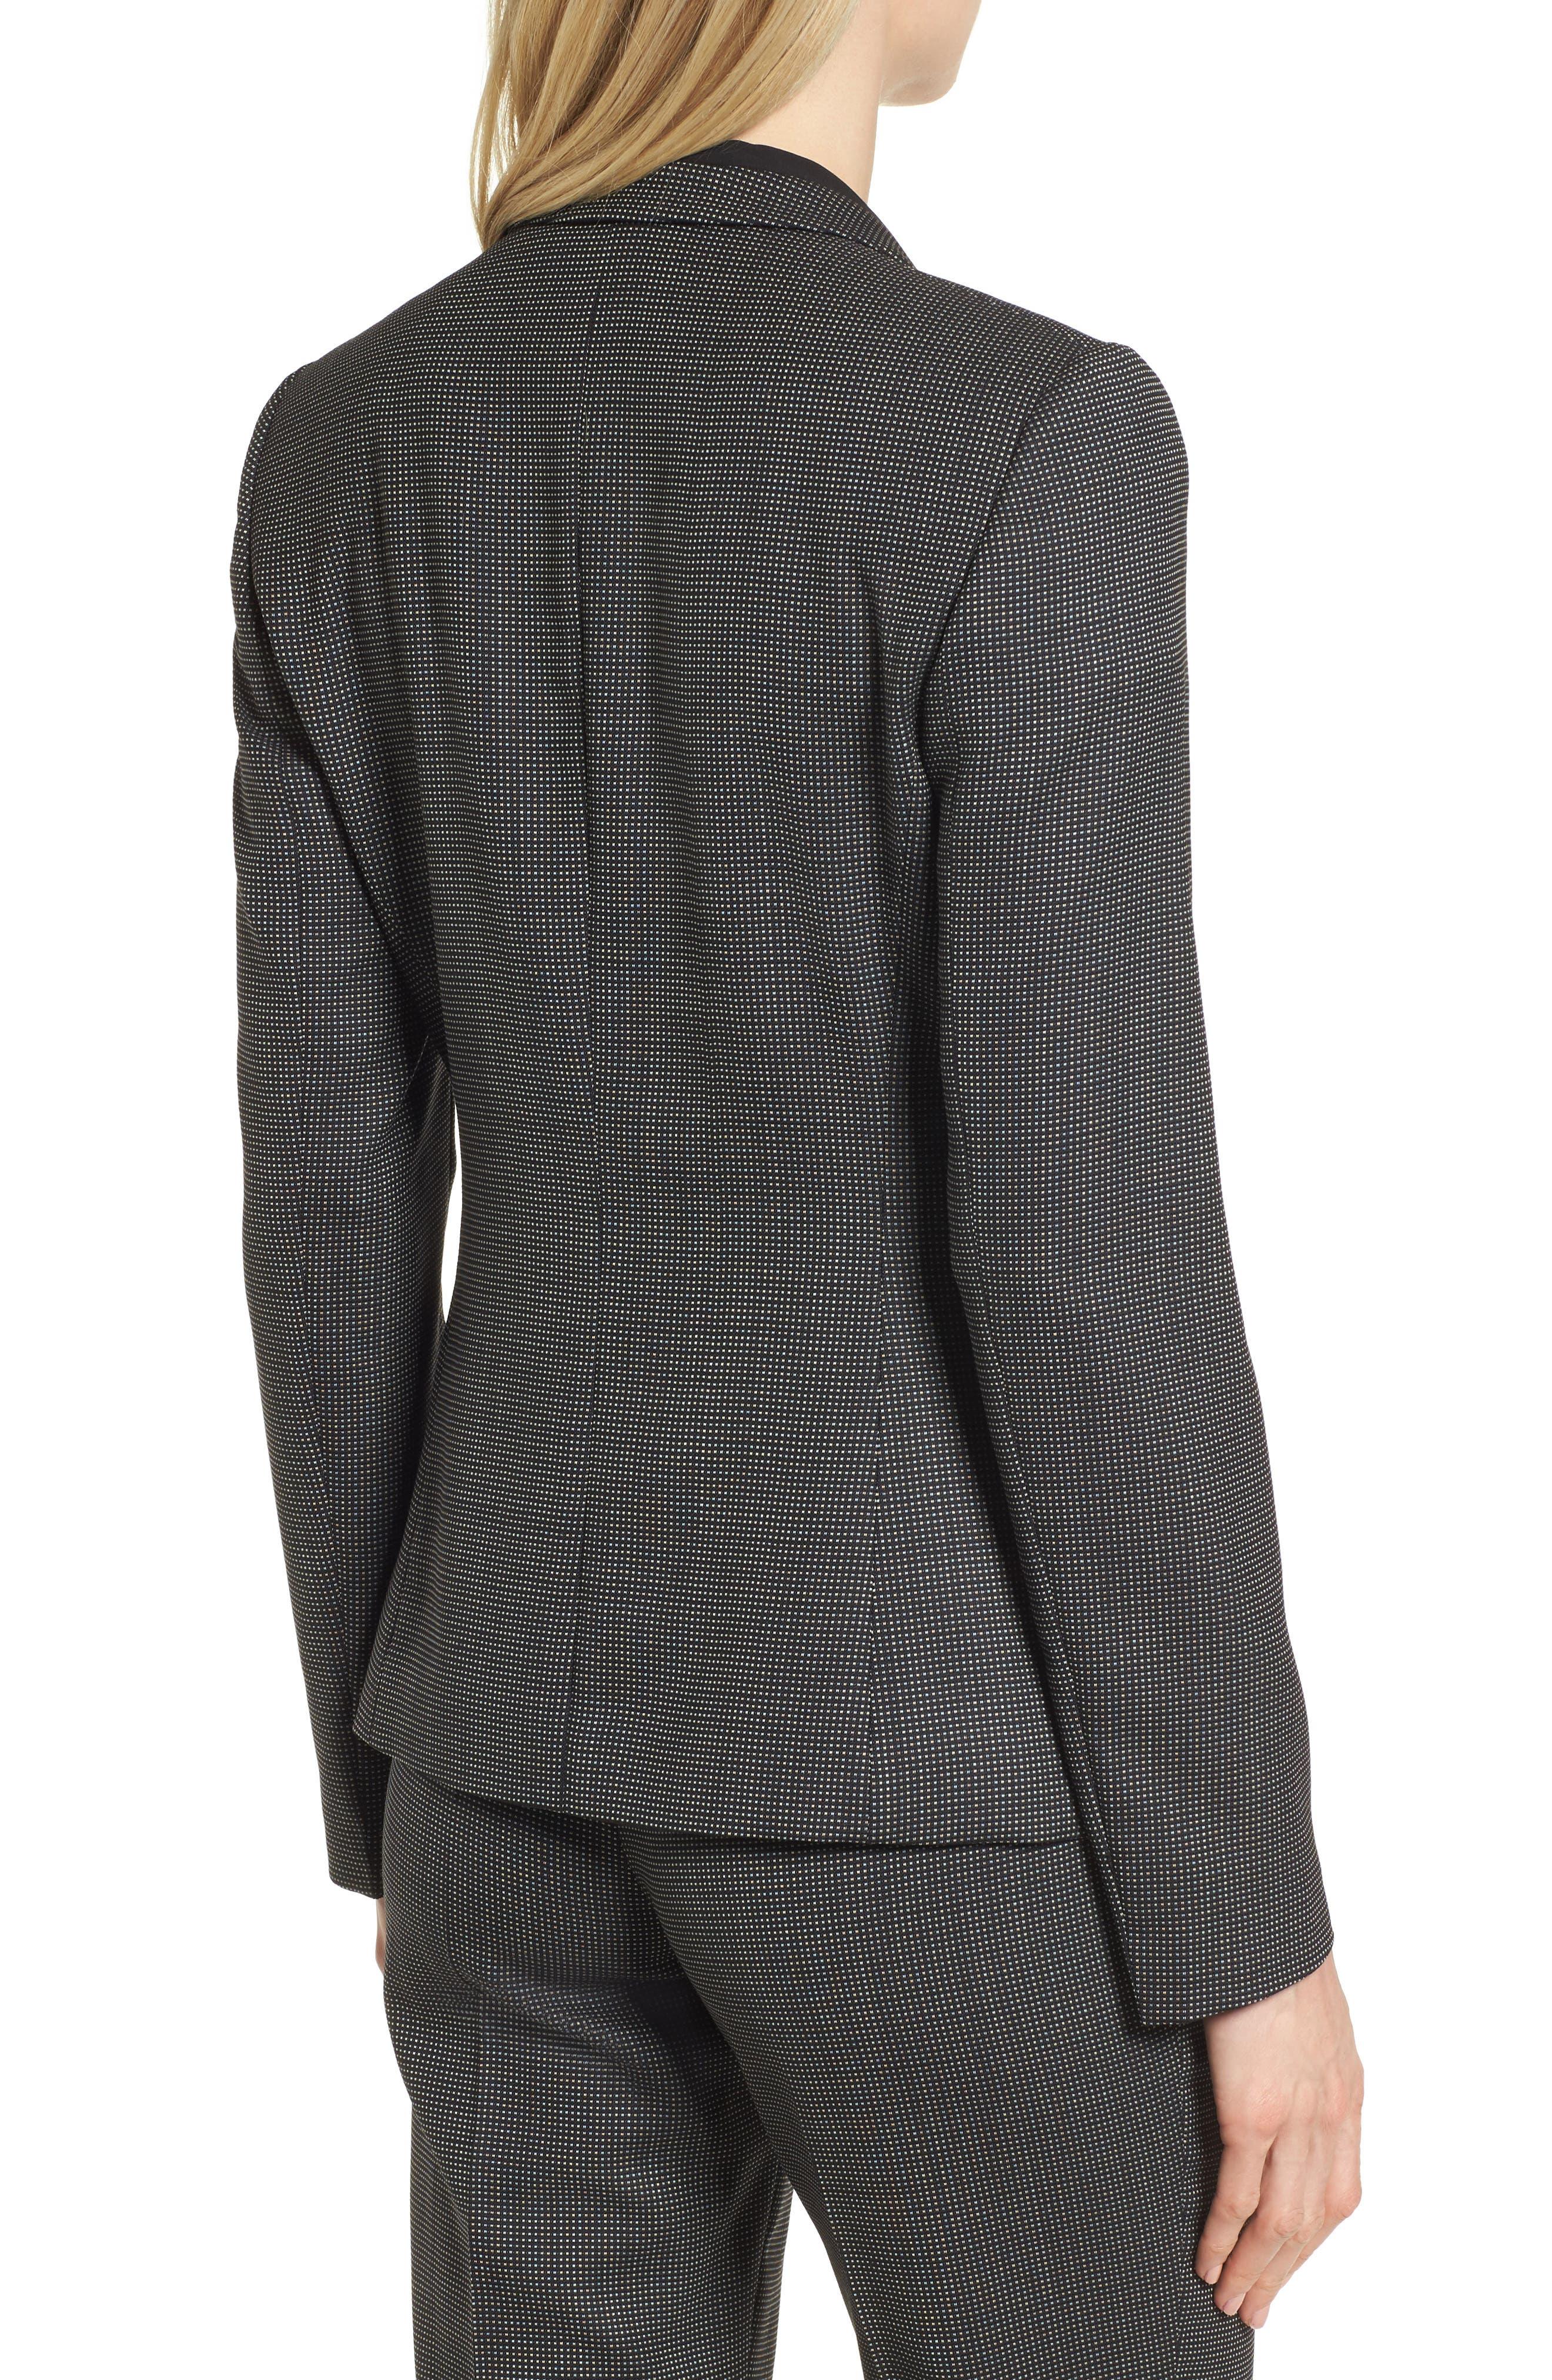 Jeresa Check Stretch Wool Suit Jacket,                             Alternate thumbnail 2, color,